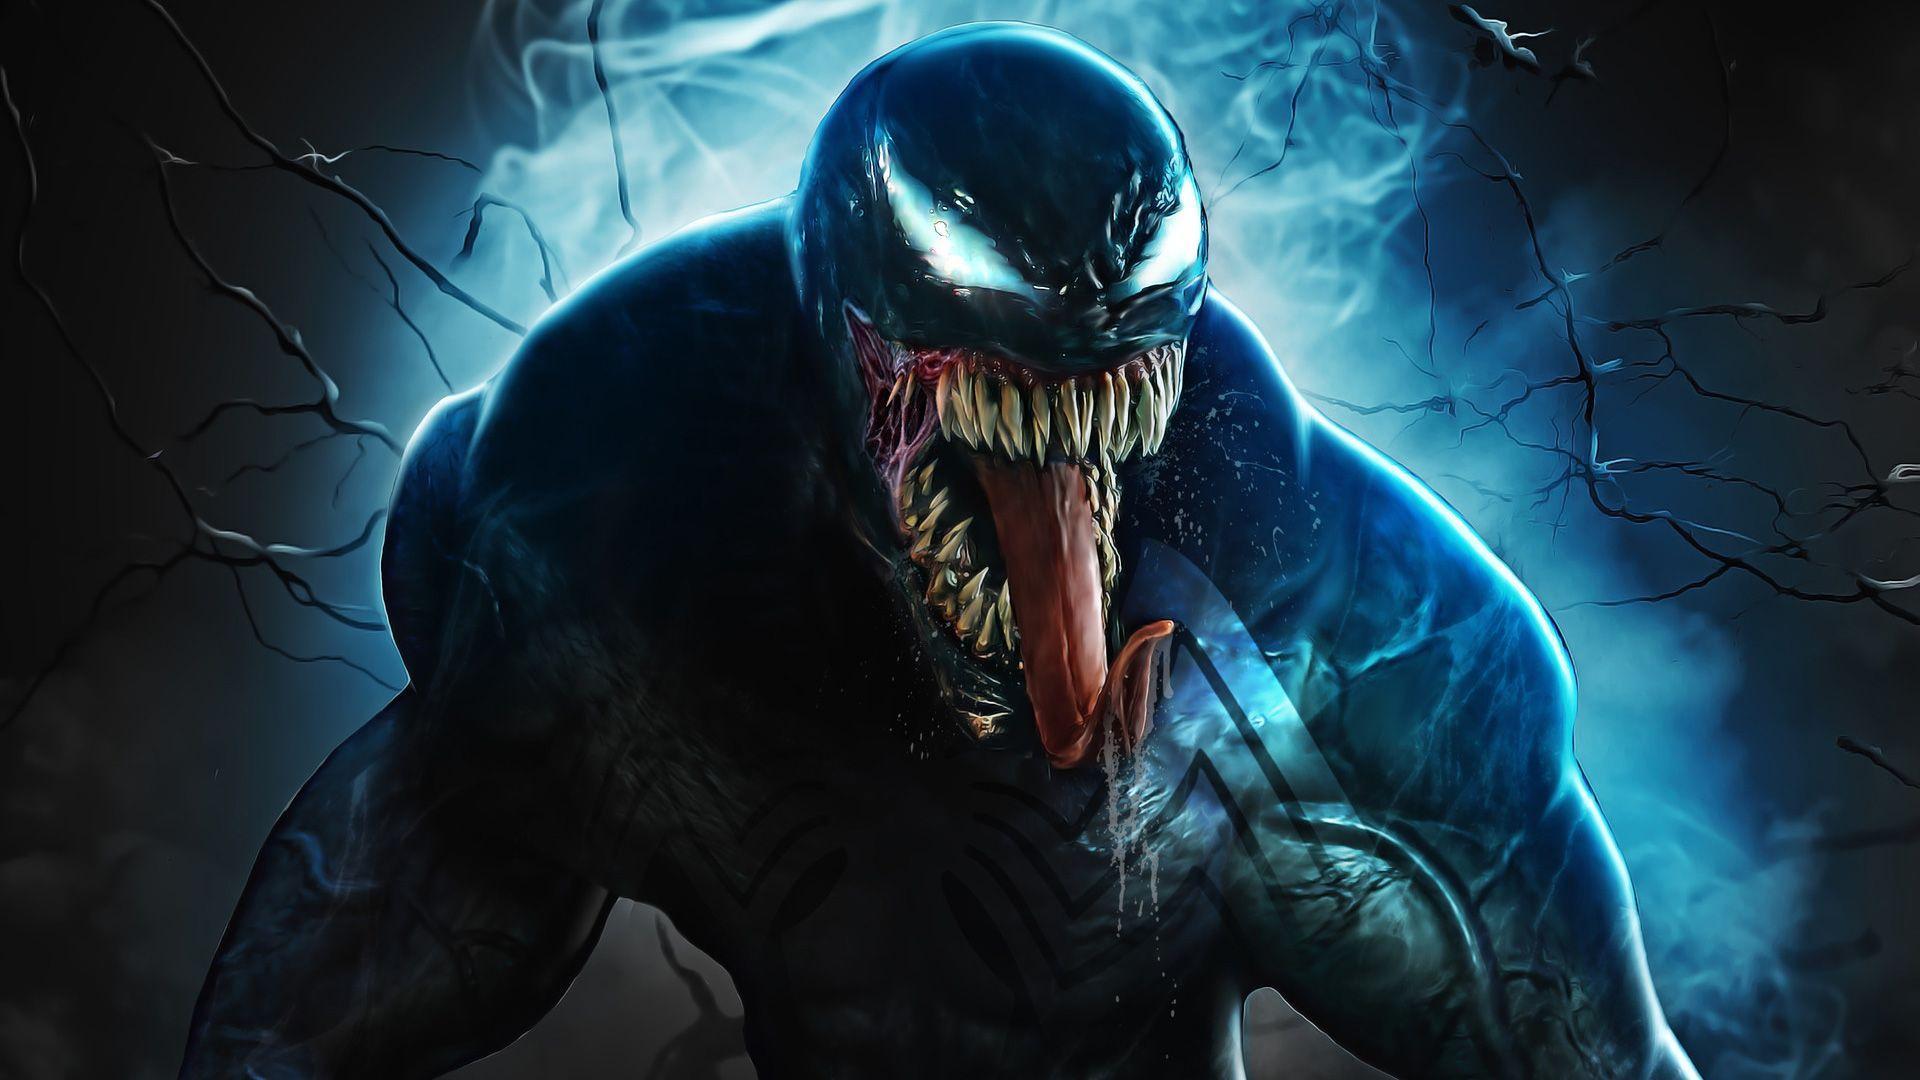 Venom Movie Full Hd Laptop Wallpapers Top Free Venom Movie Full Hd